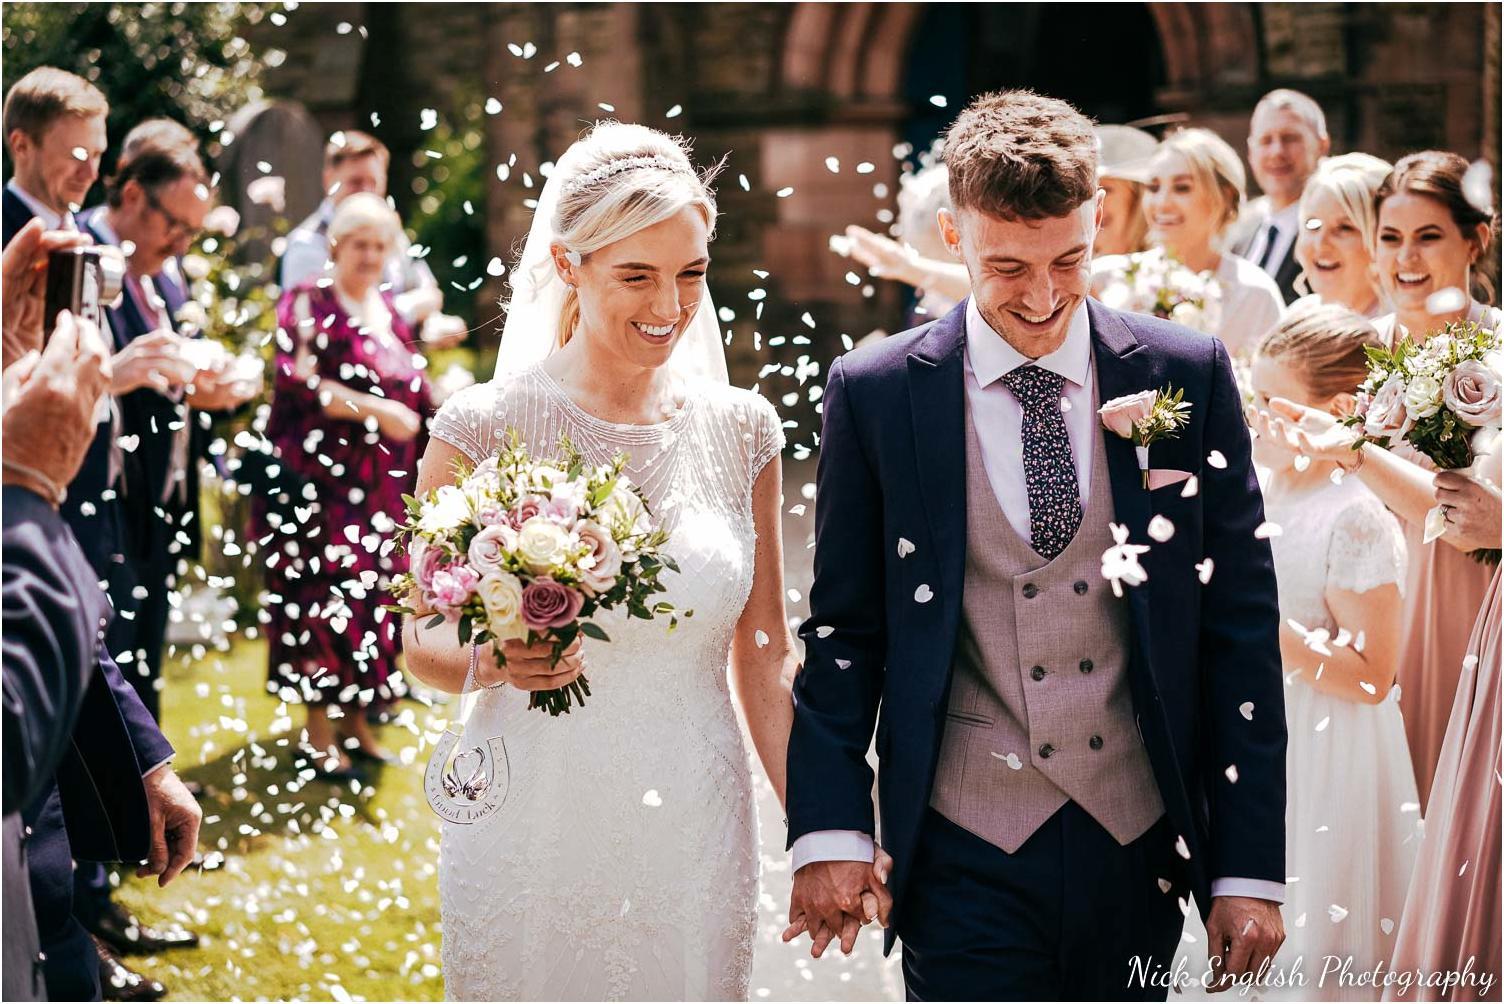 Mitton_Hall_Wedding_Photograph-54.jpg